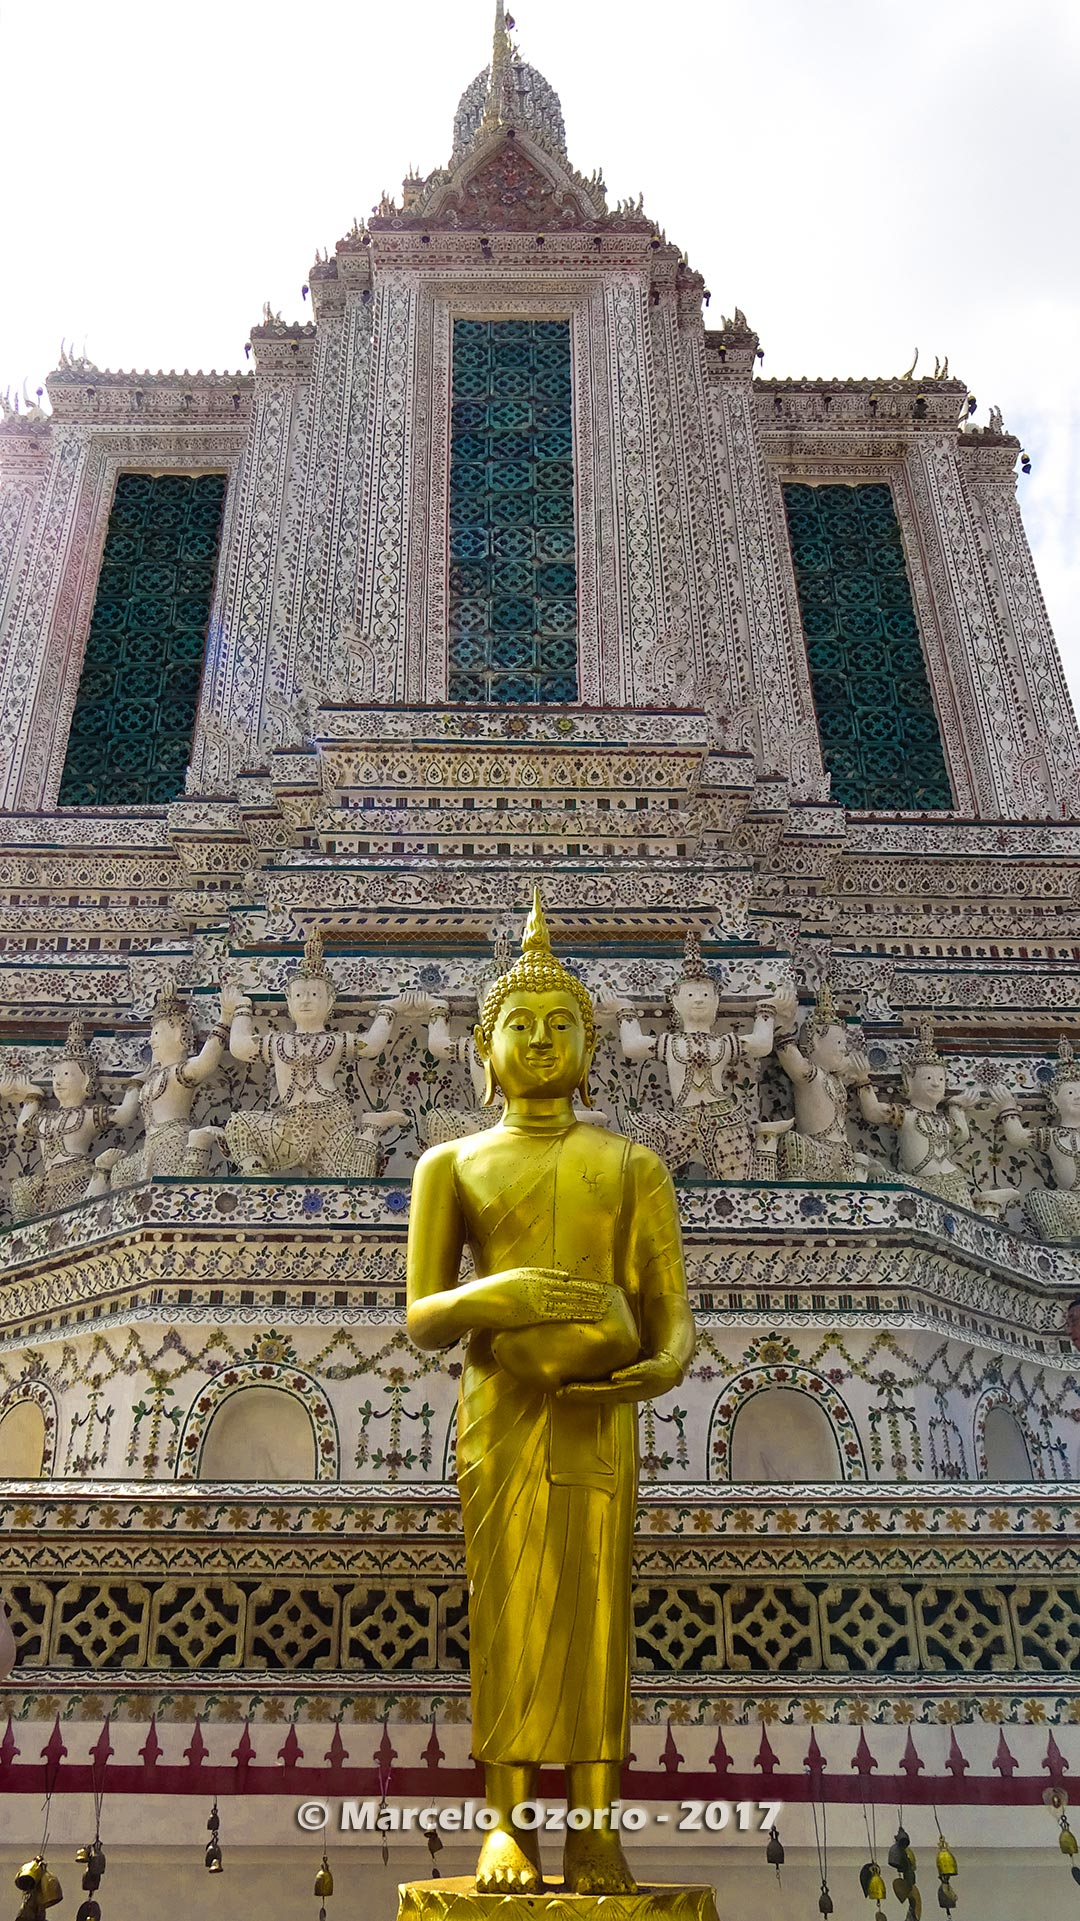 budhas bangkok thailand serie 23 - Buddhas of Bangkok - Thailand